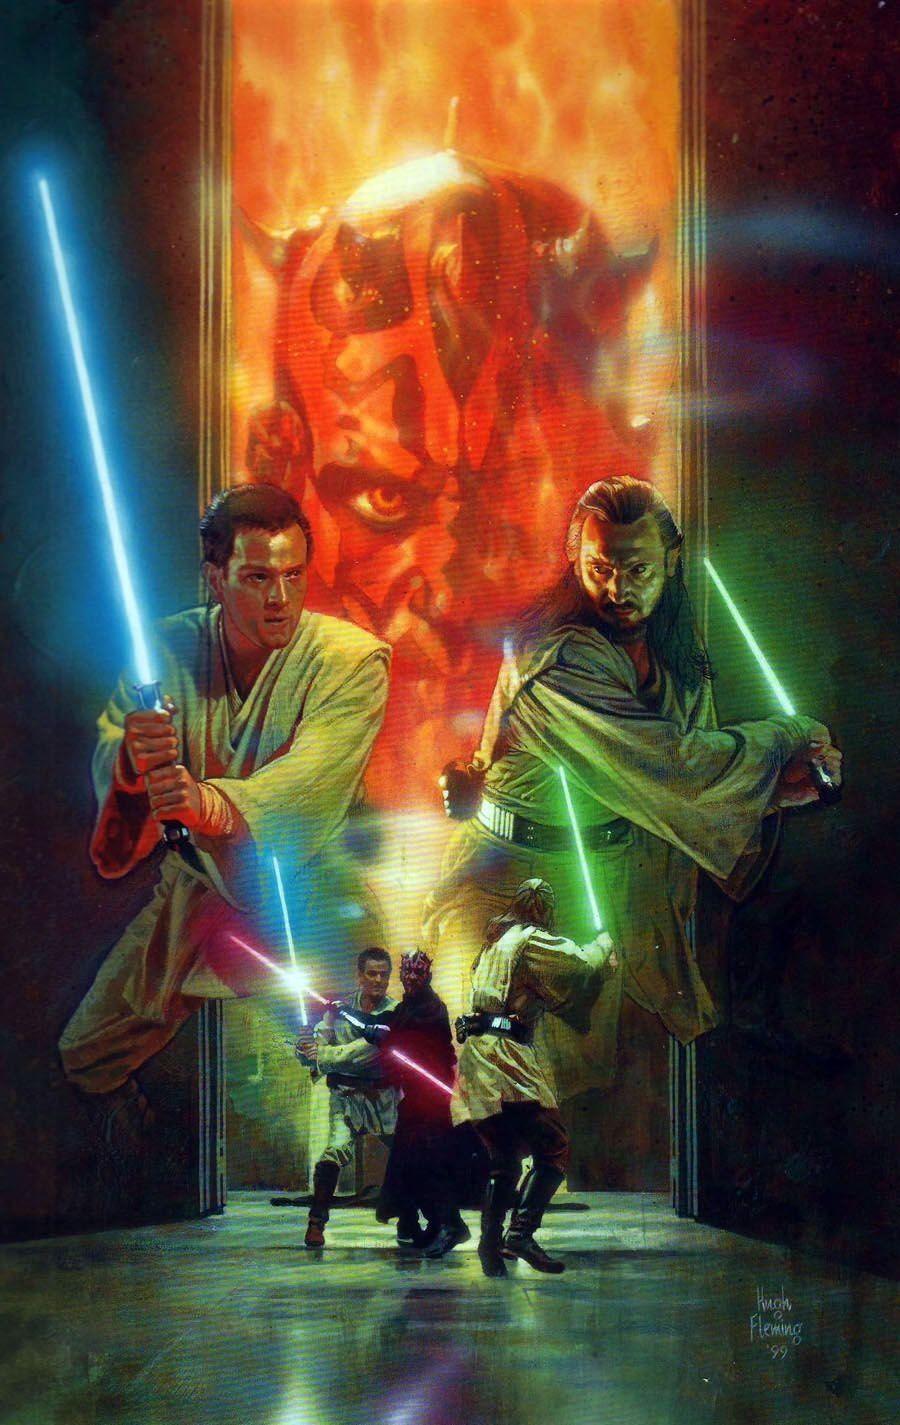 Duel Of The Fates Star Wars Art Star Wars Fandom Star Wars Pictures